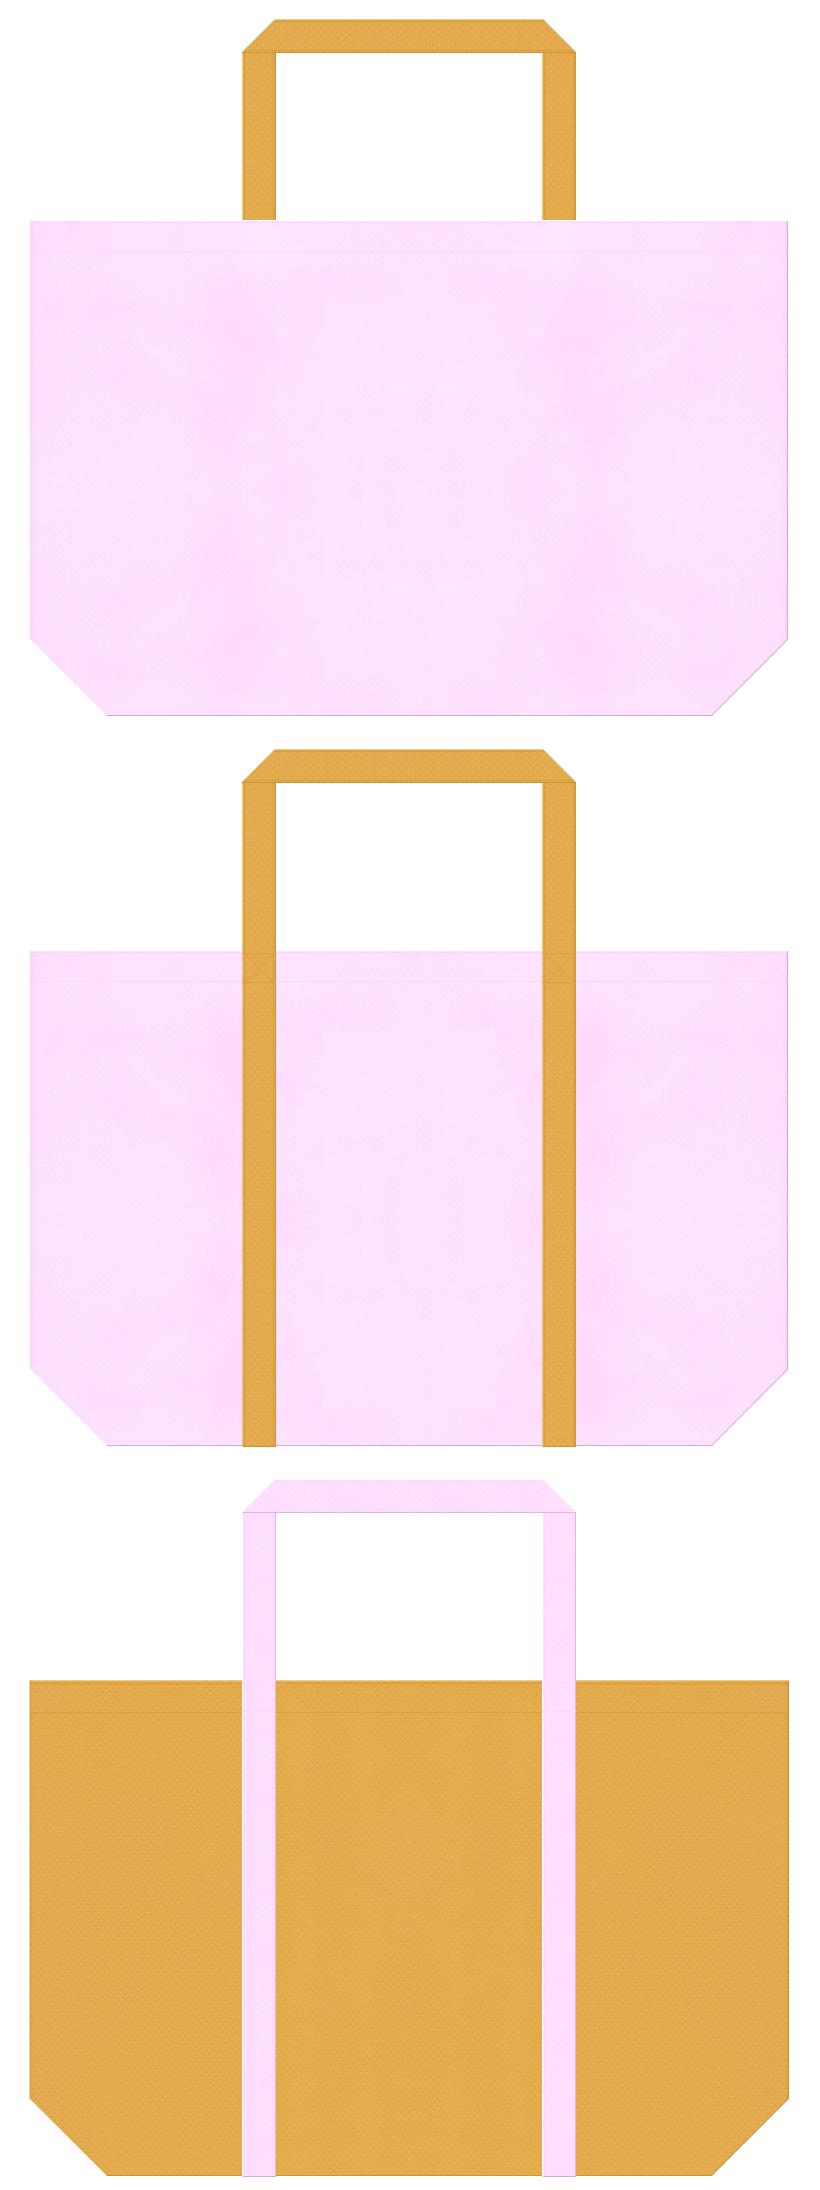 girlyなバッグノベルティにお奨めのコーデ。明るいピンク色と黄土色の不織布バッグデザイン。